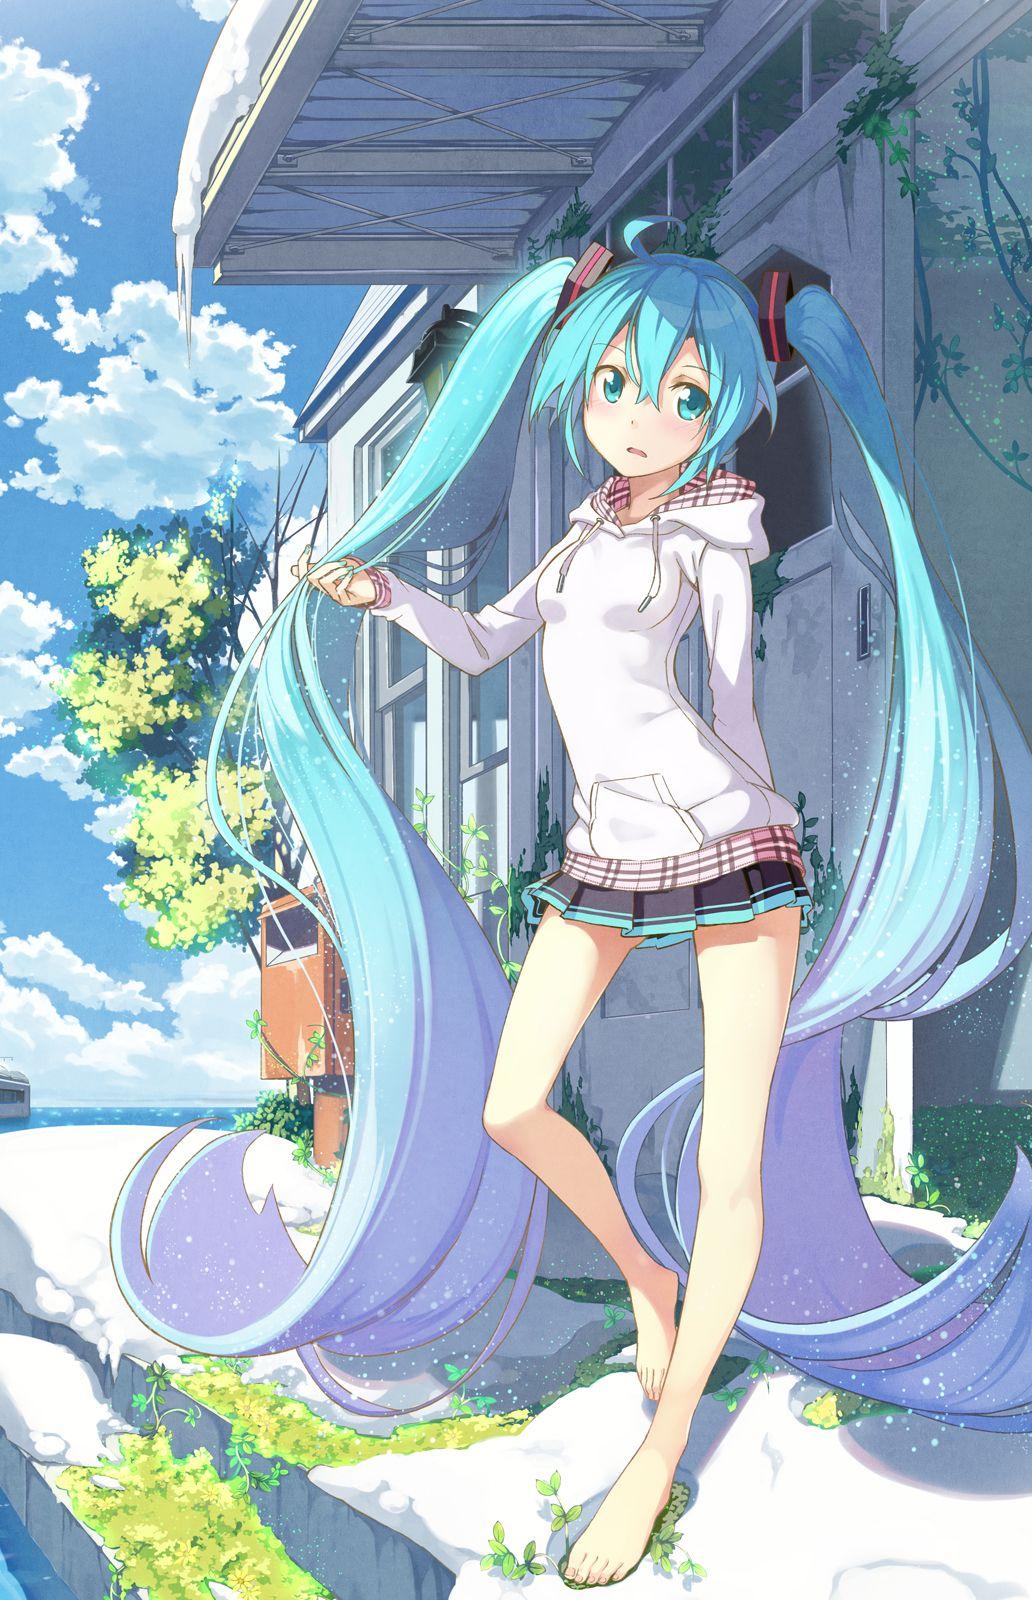 Bot On  Hatsune Miku  Anime, Hatsune Miku, Anime Art-6673